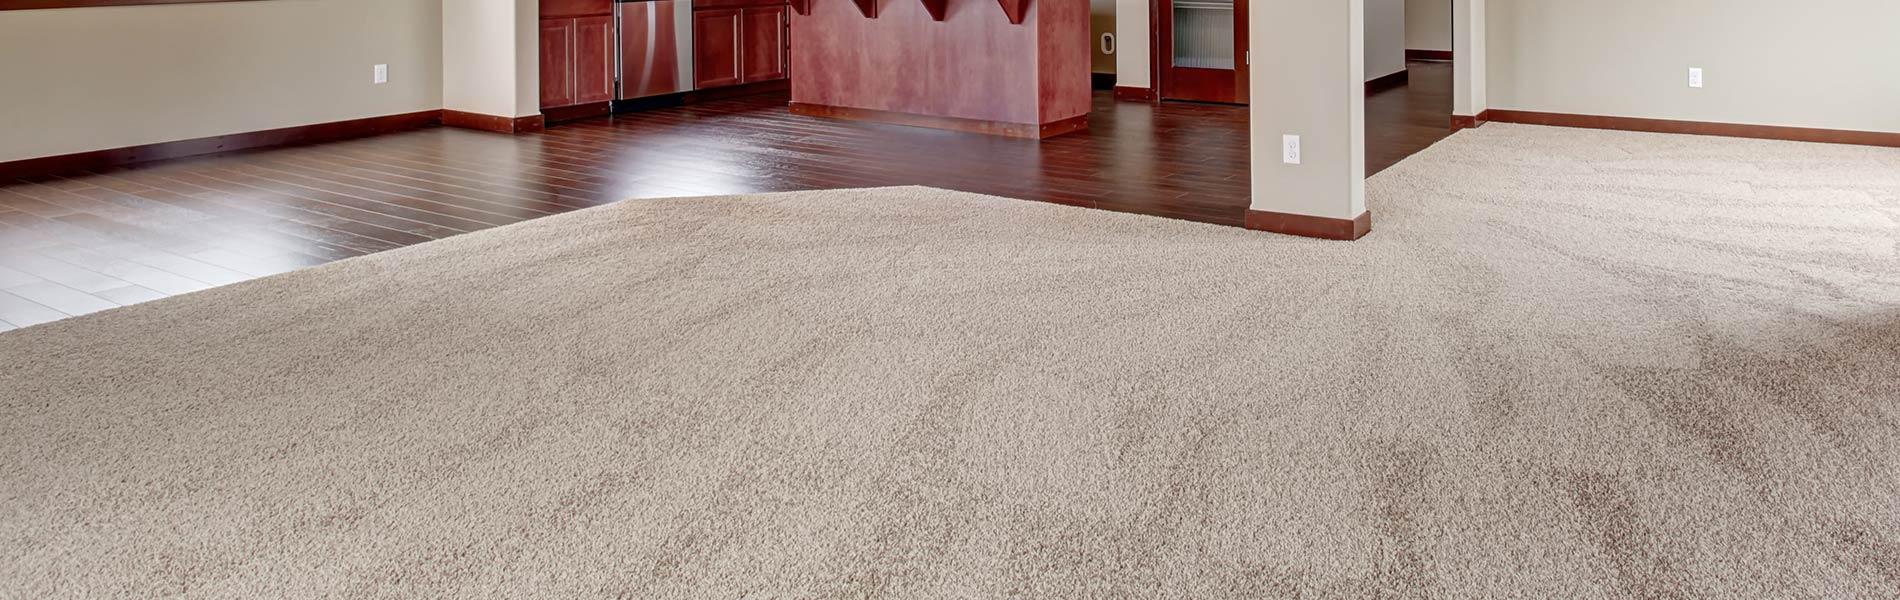 Carpet Installation Service In Bakersfield Ca Carpet Store